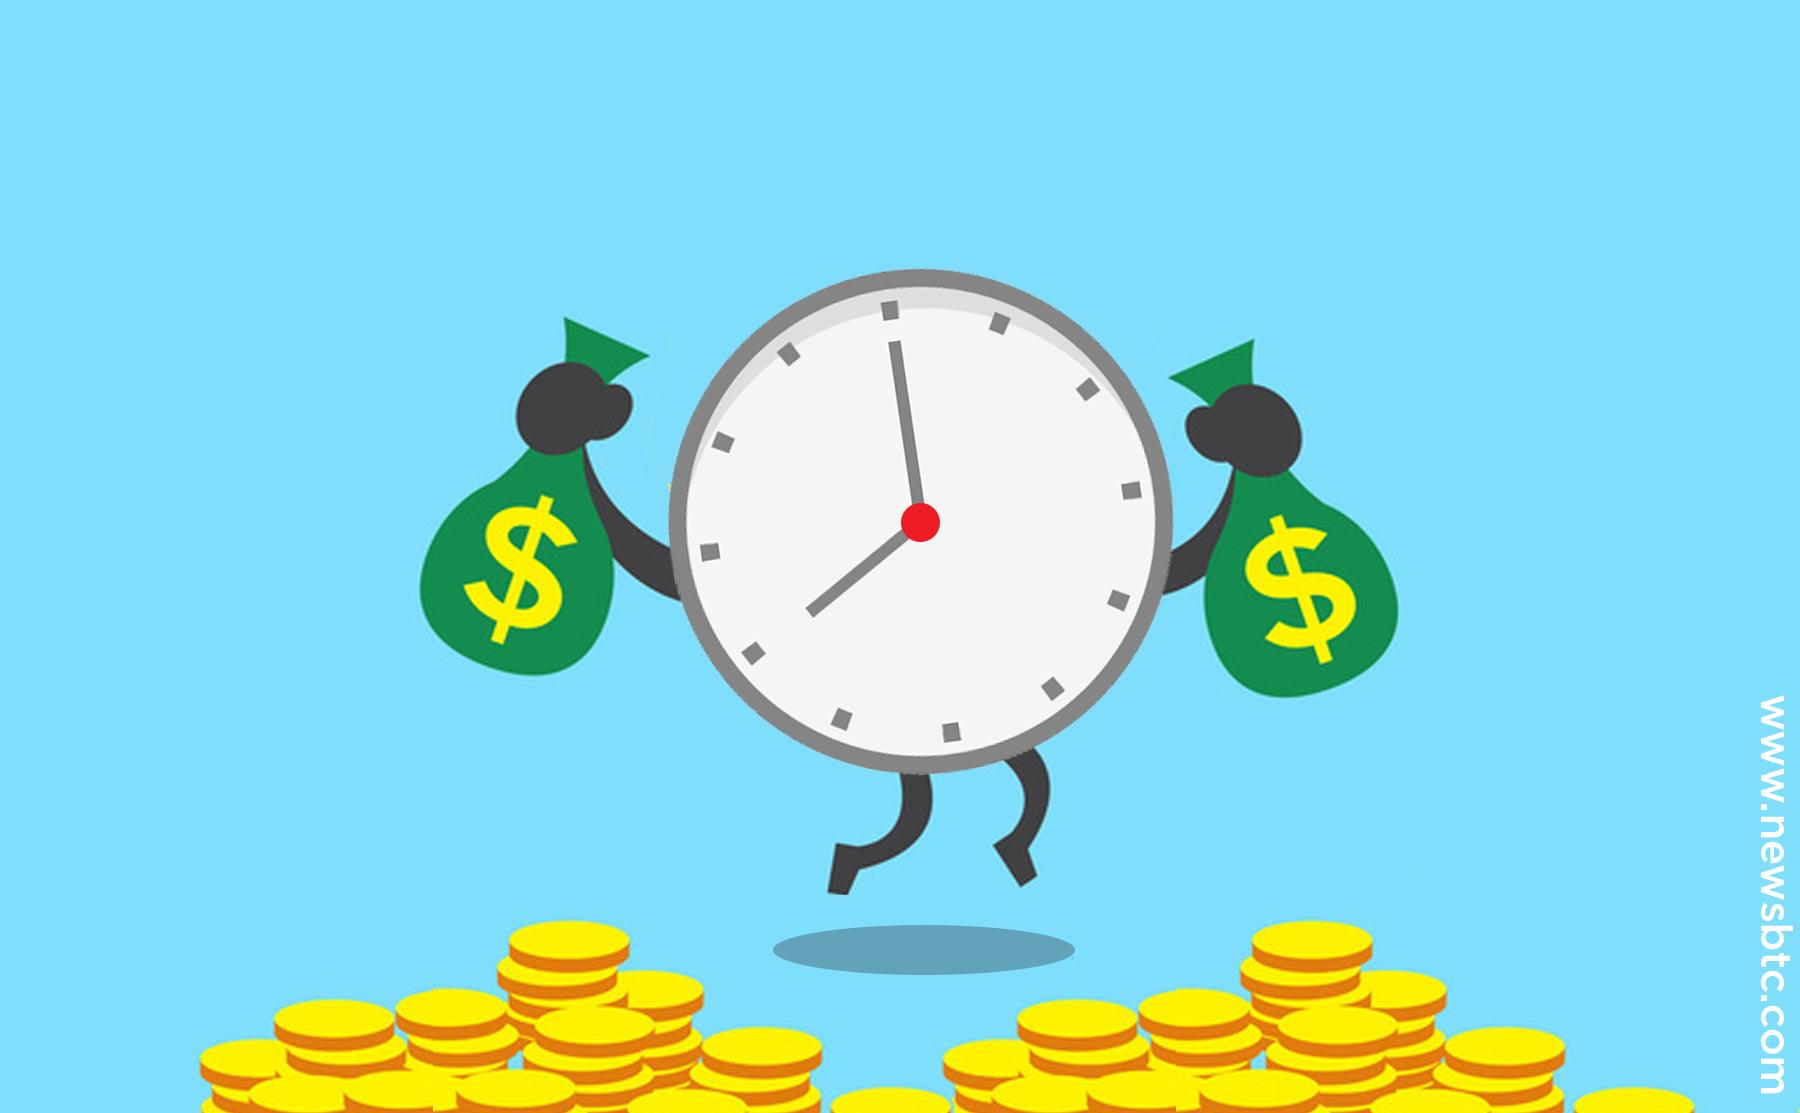 BAT, ICO, crowdsale, bitcoin growth fund